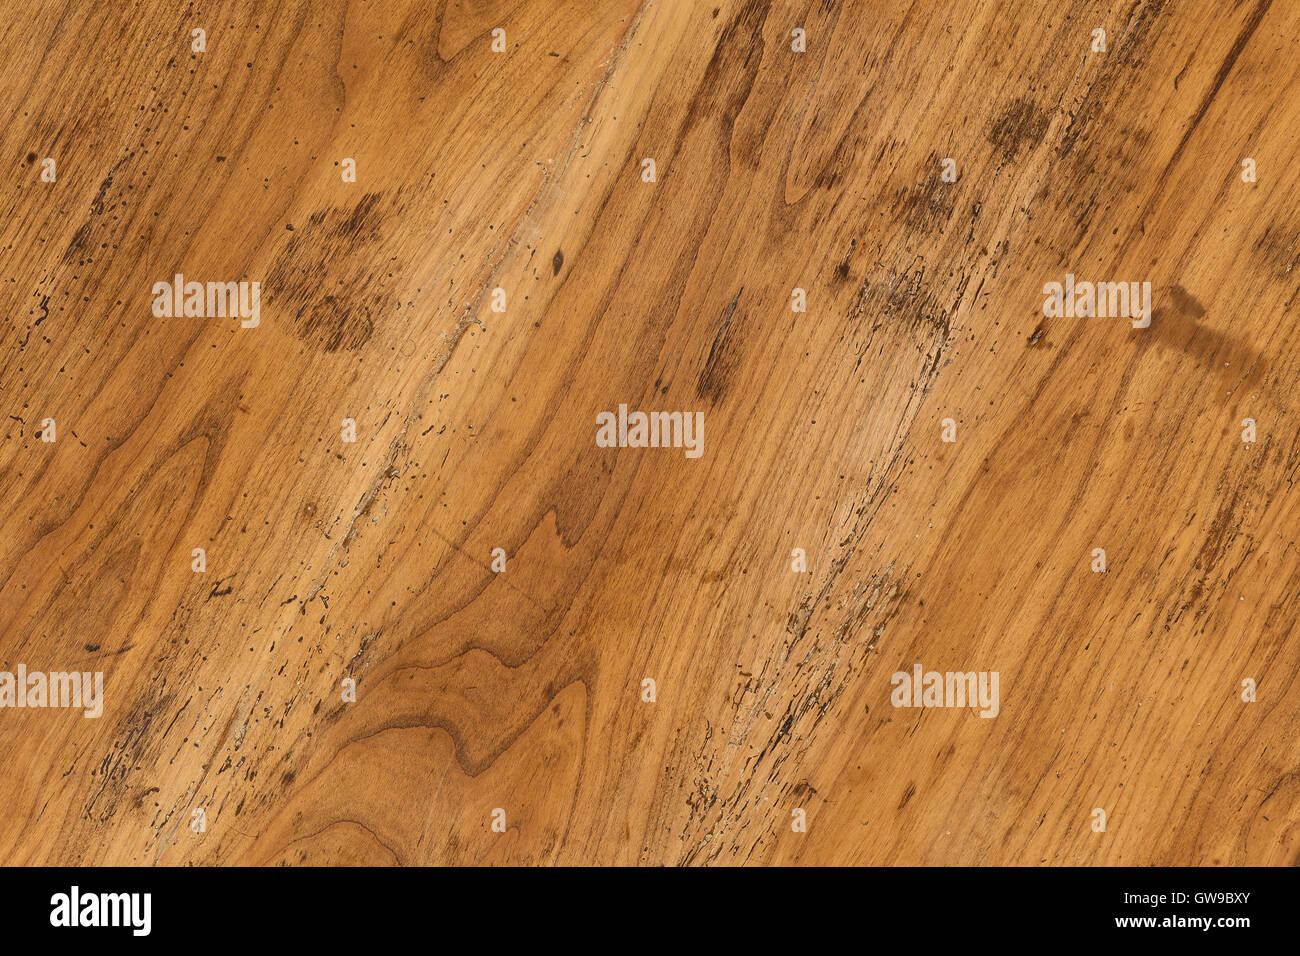 mahogany background stockfotos mahogany background bilder alamy. Black Bedroom Furniture Sets. Home Design Ideas